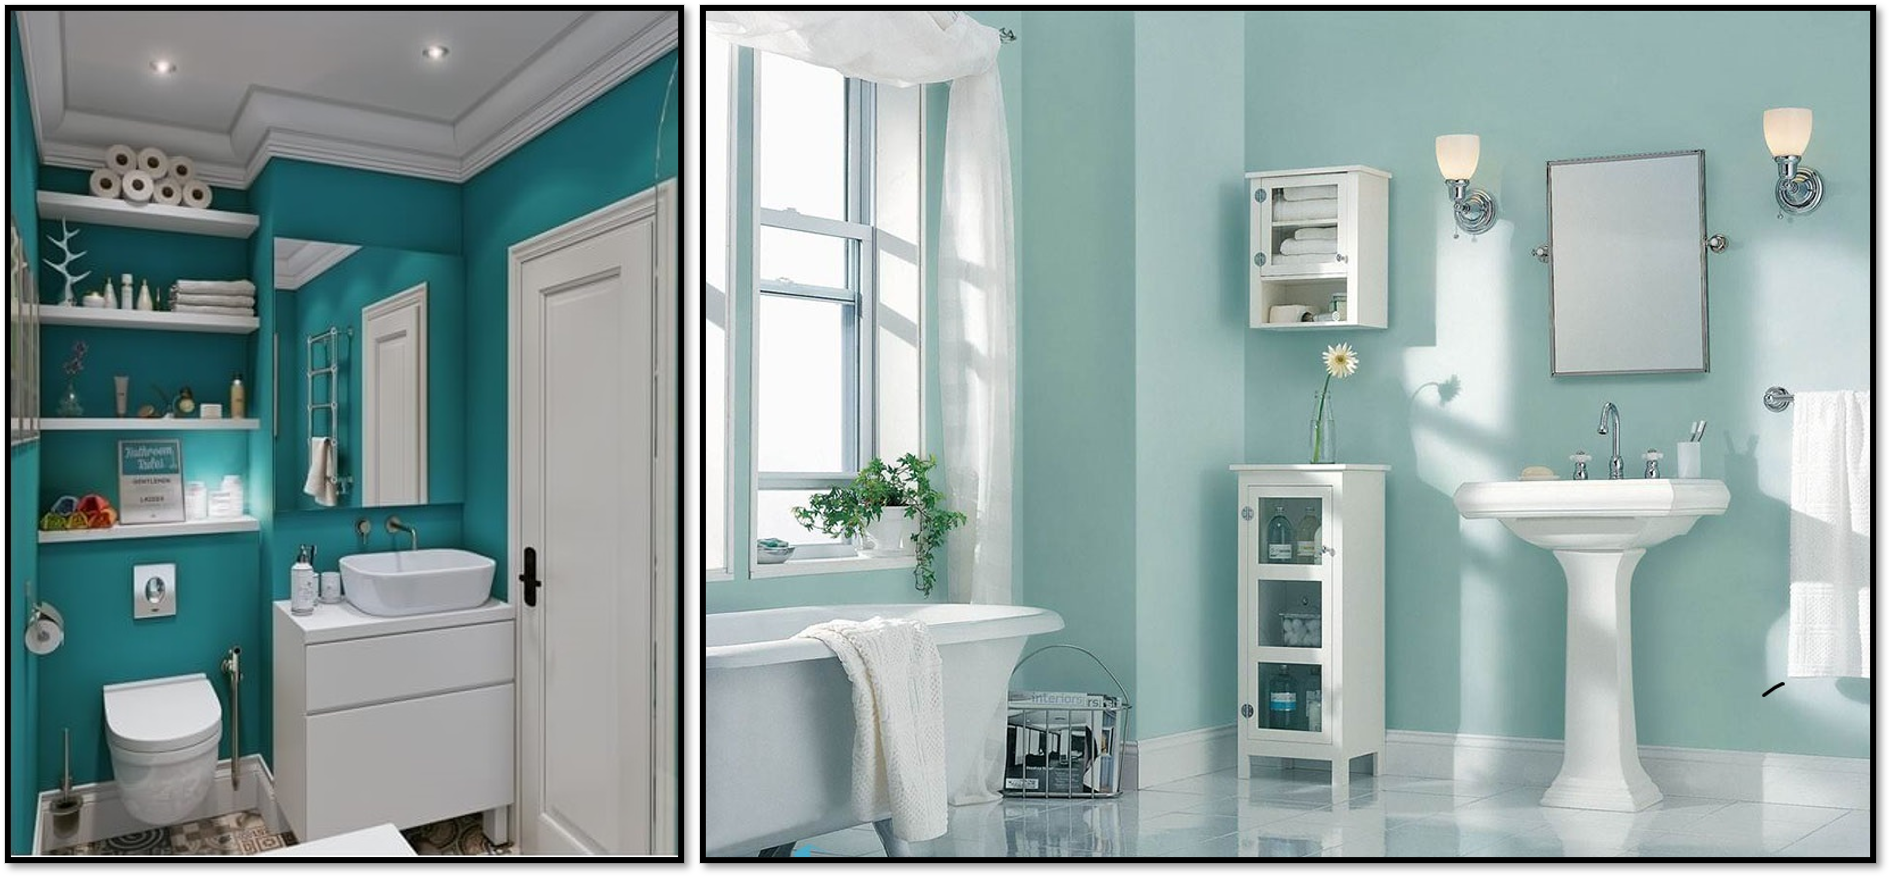 سرویس بهداشتی سبز آبی